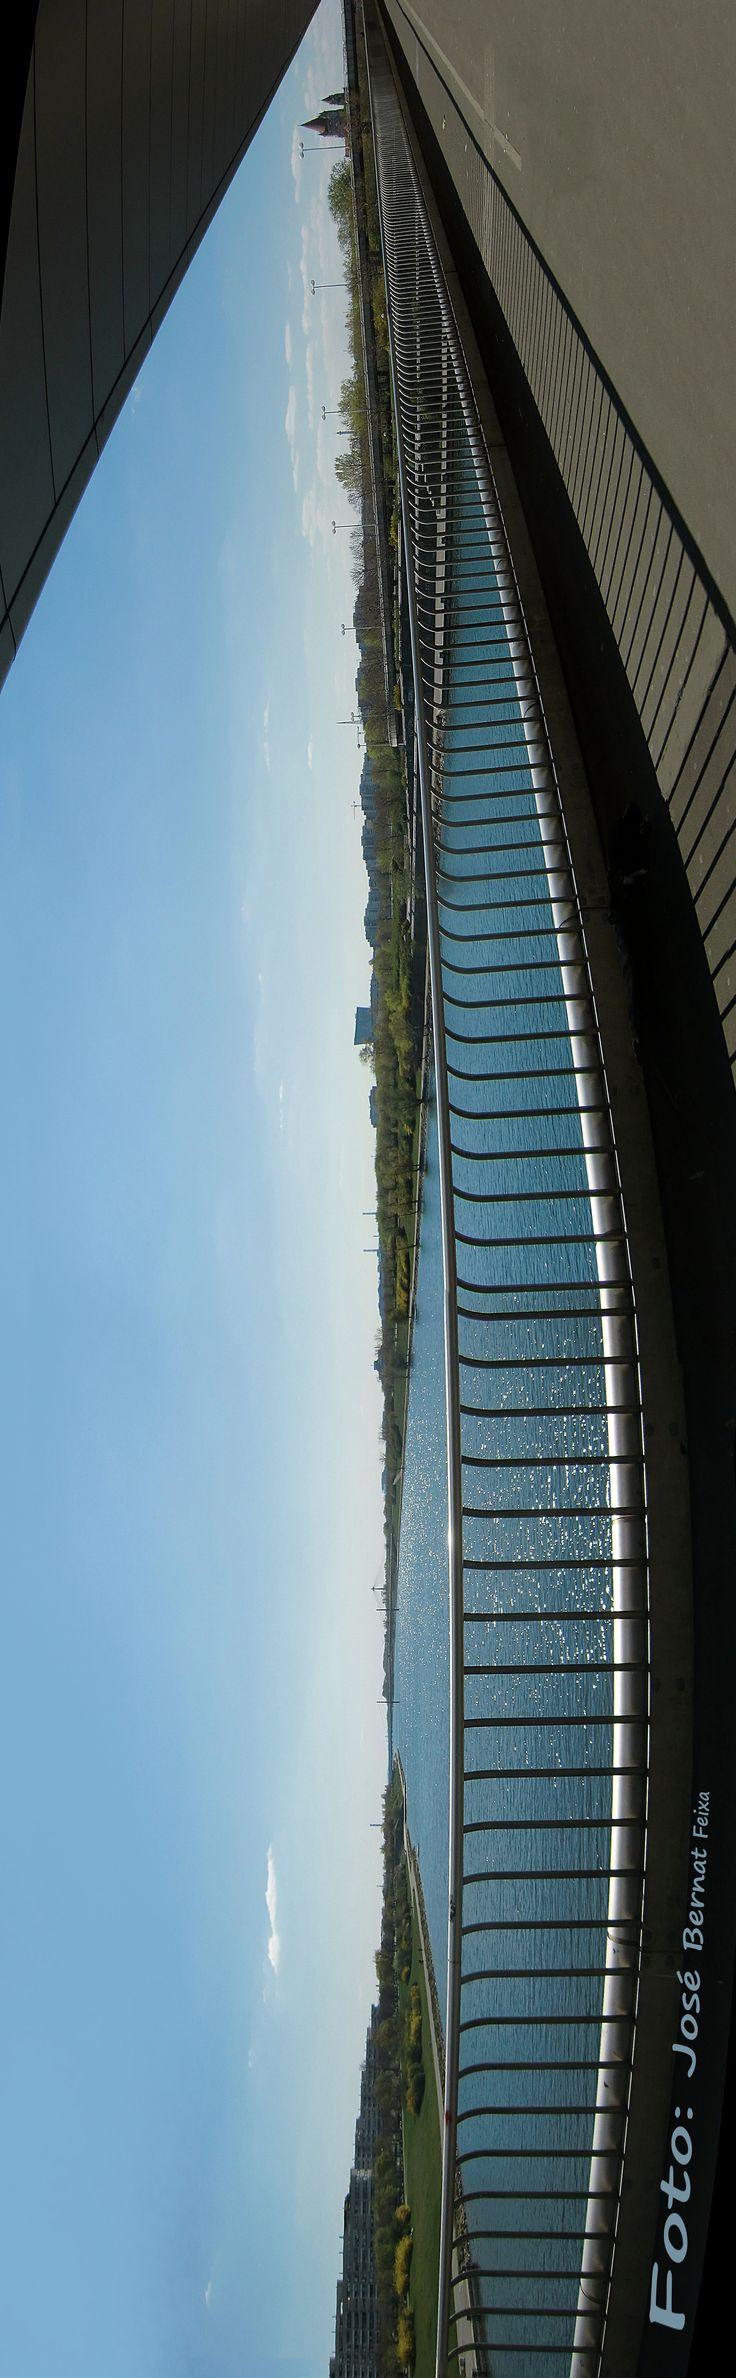 Brug over de Donau, Wenen